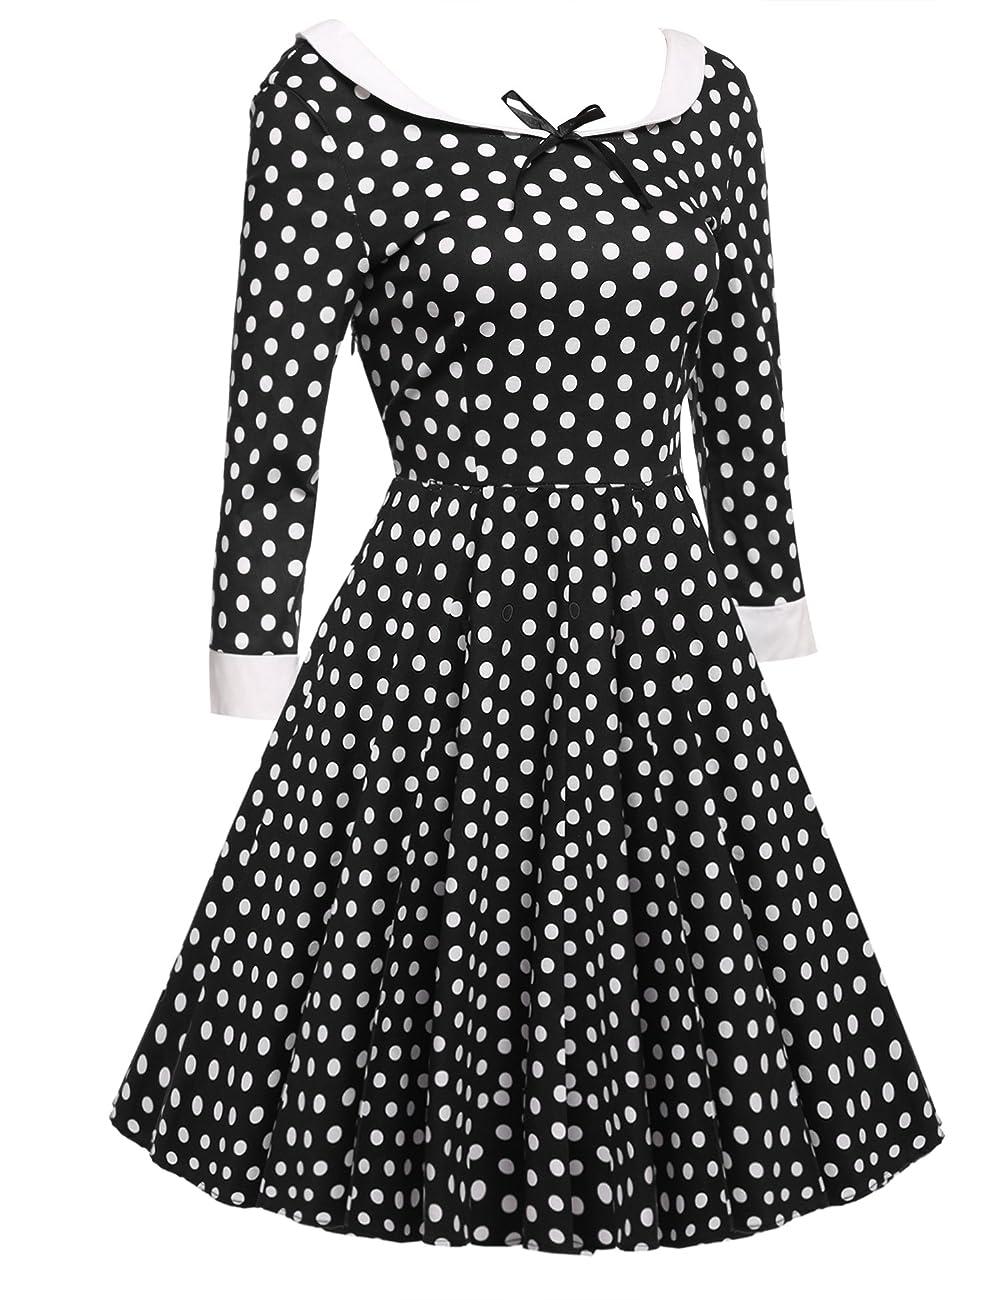 ACEVOG Women's Vintage 50s Elegant Polka Dot Formal Casual Party Dress 1